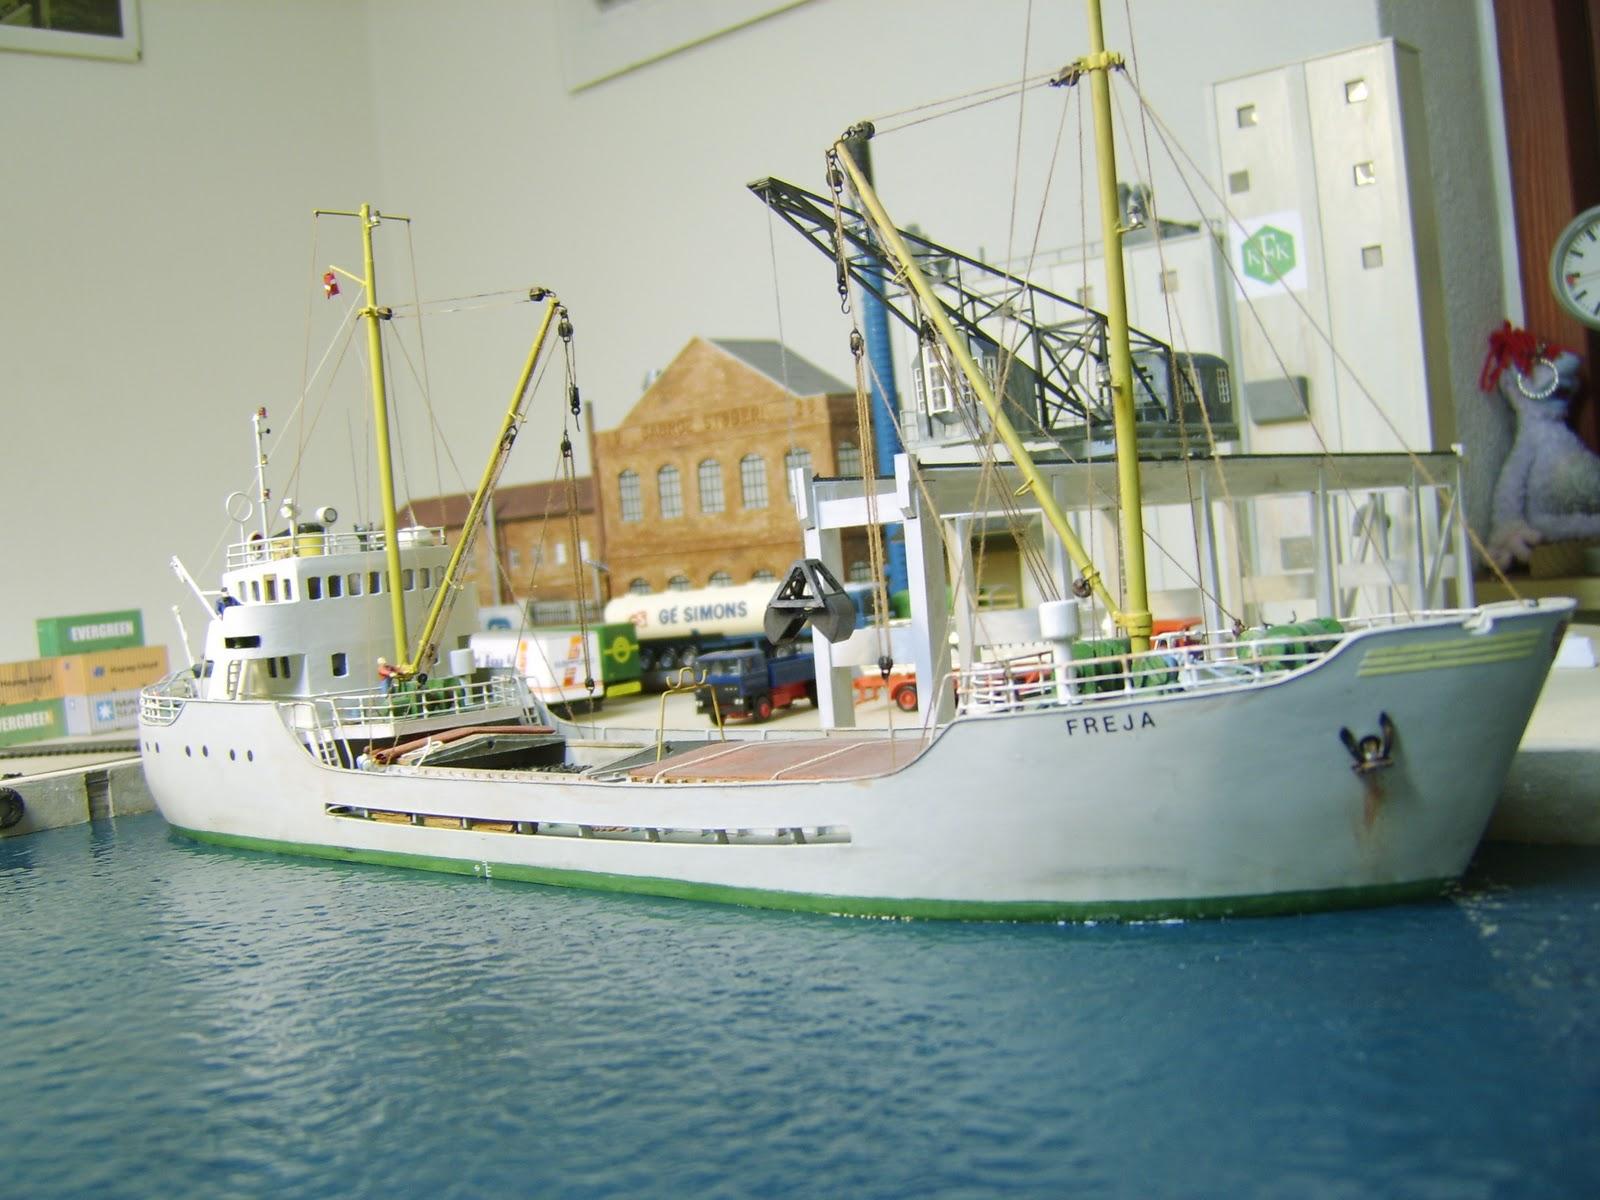 Familie Nielsens Bane/Modeltog: Skibe.